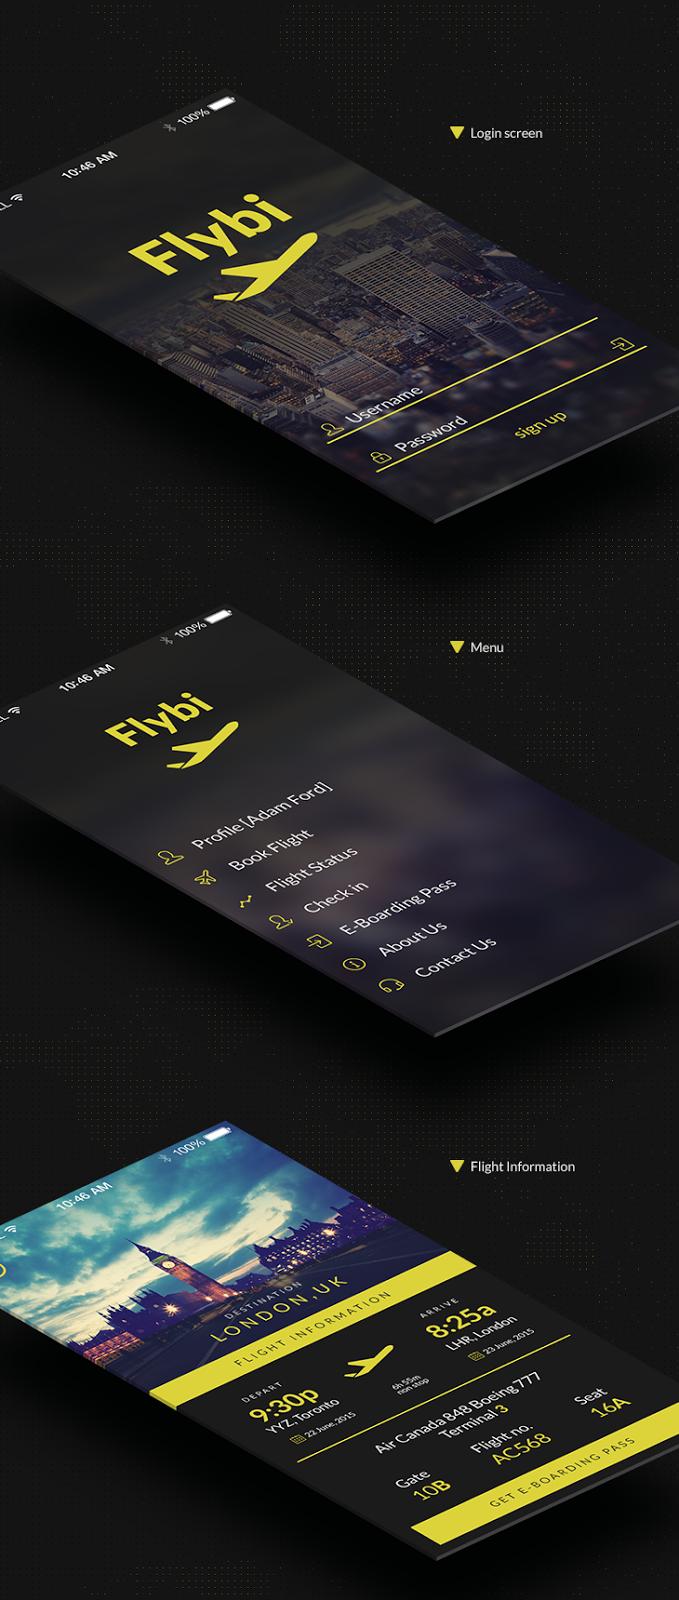 Flybi iOS App Screens UI PSD